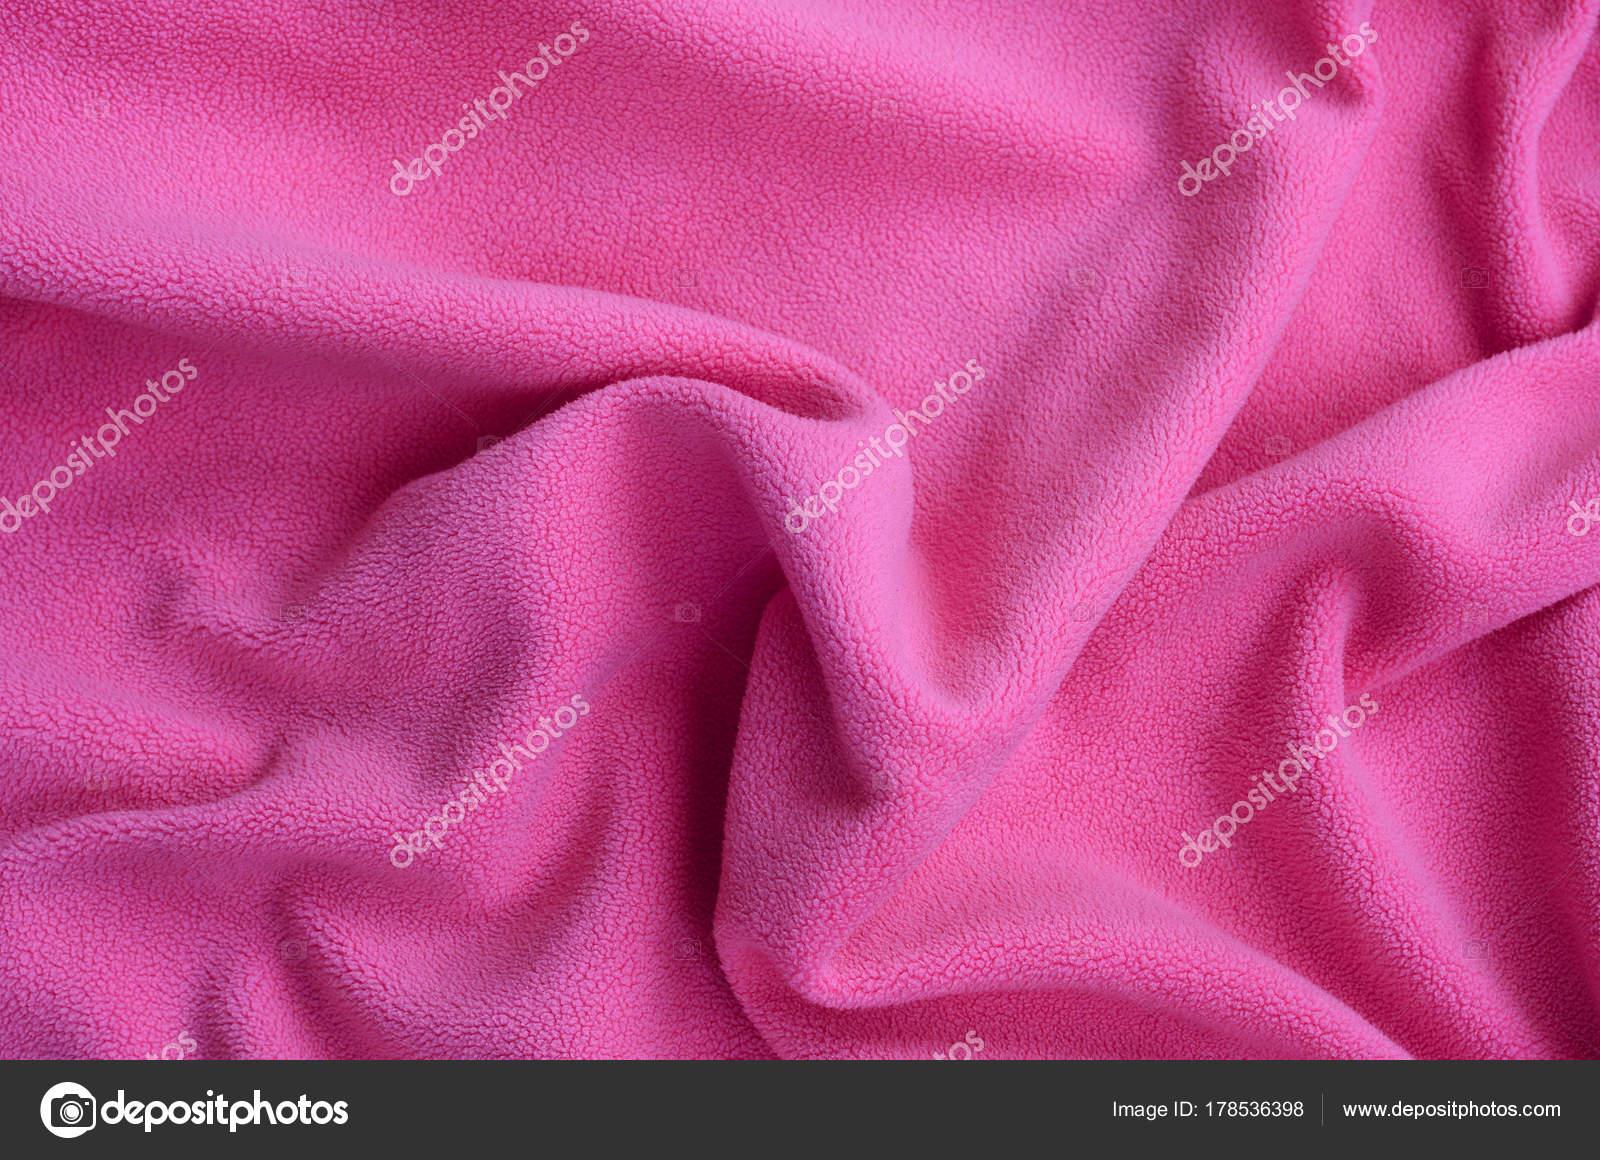 Carta Da Parati Pelosa Rosa : Coperta tessuto pile rosa pelose fondo materiale leggero rosa pile